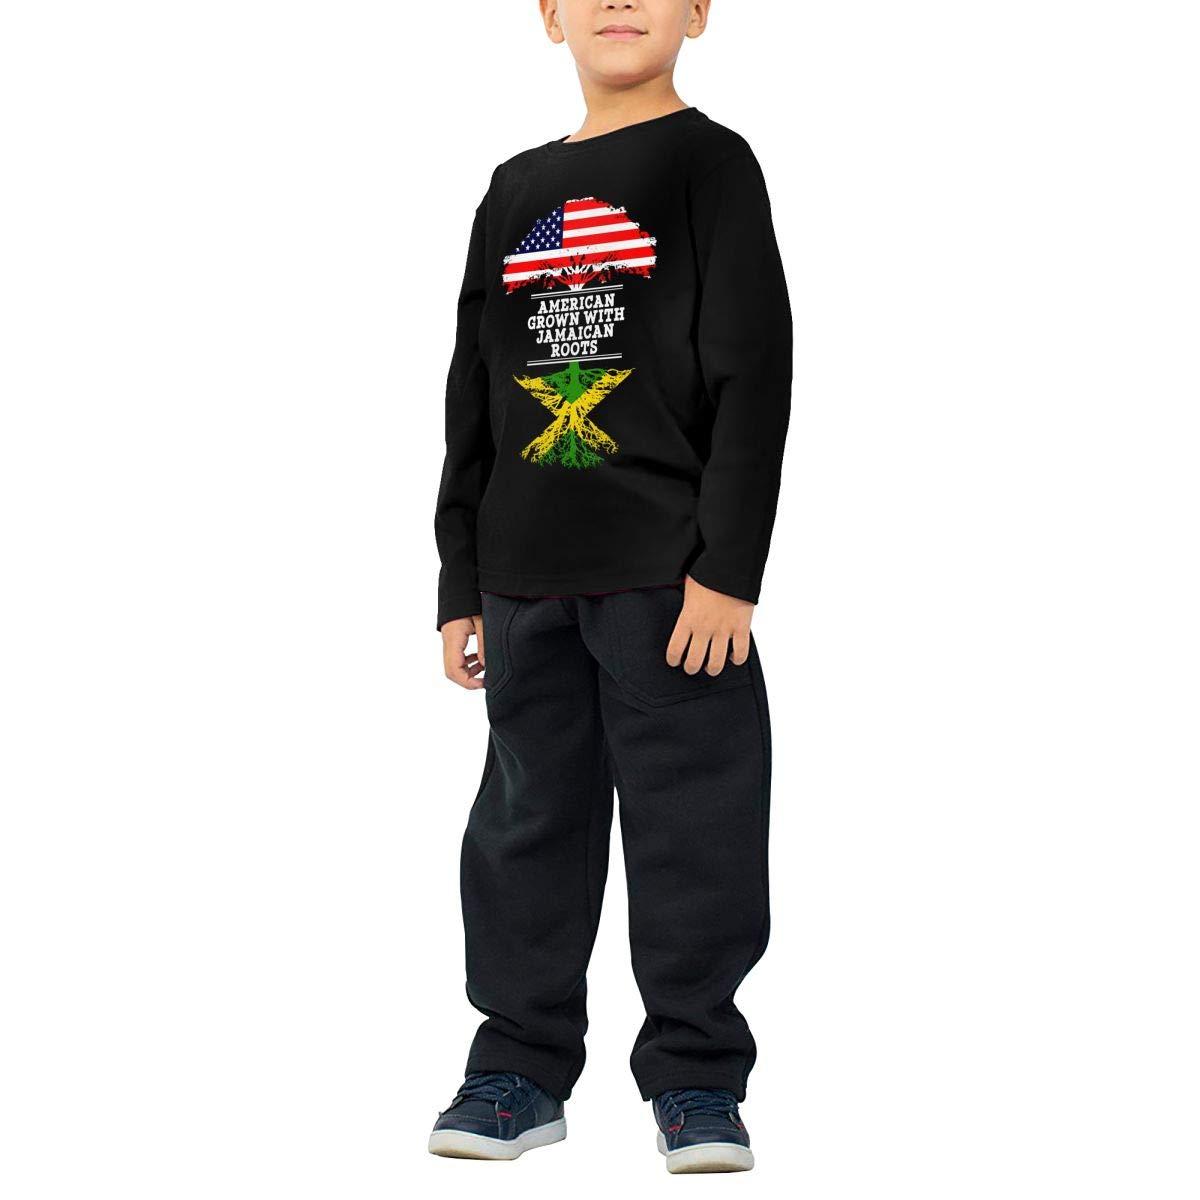 HADYKIDSLOVE American Grown with Jamaican Roots Kids T-Shirt Long Sleeve Boys Girls T-Shirt